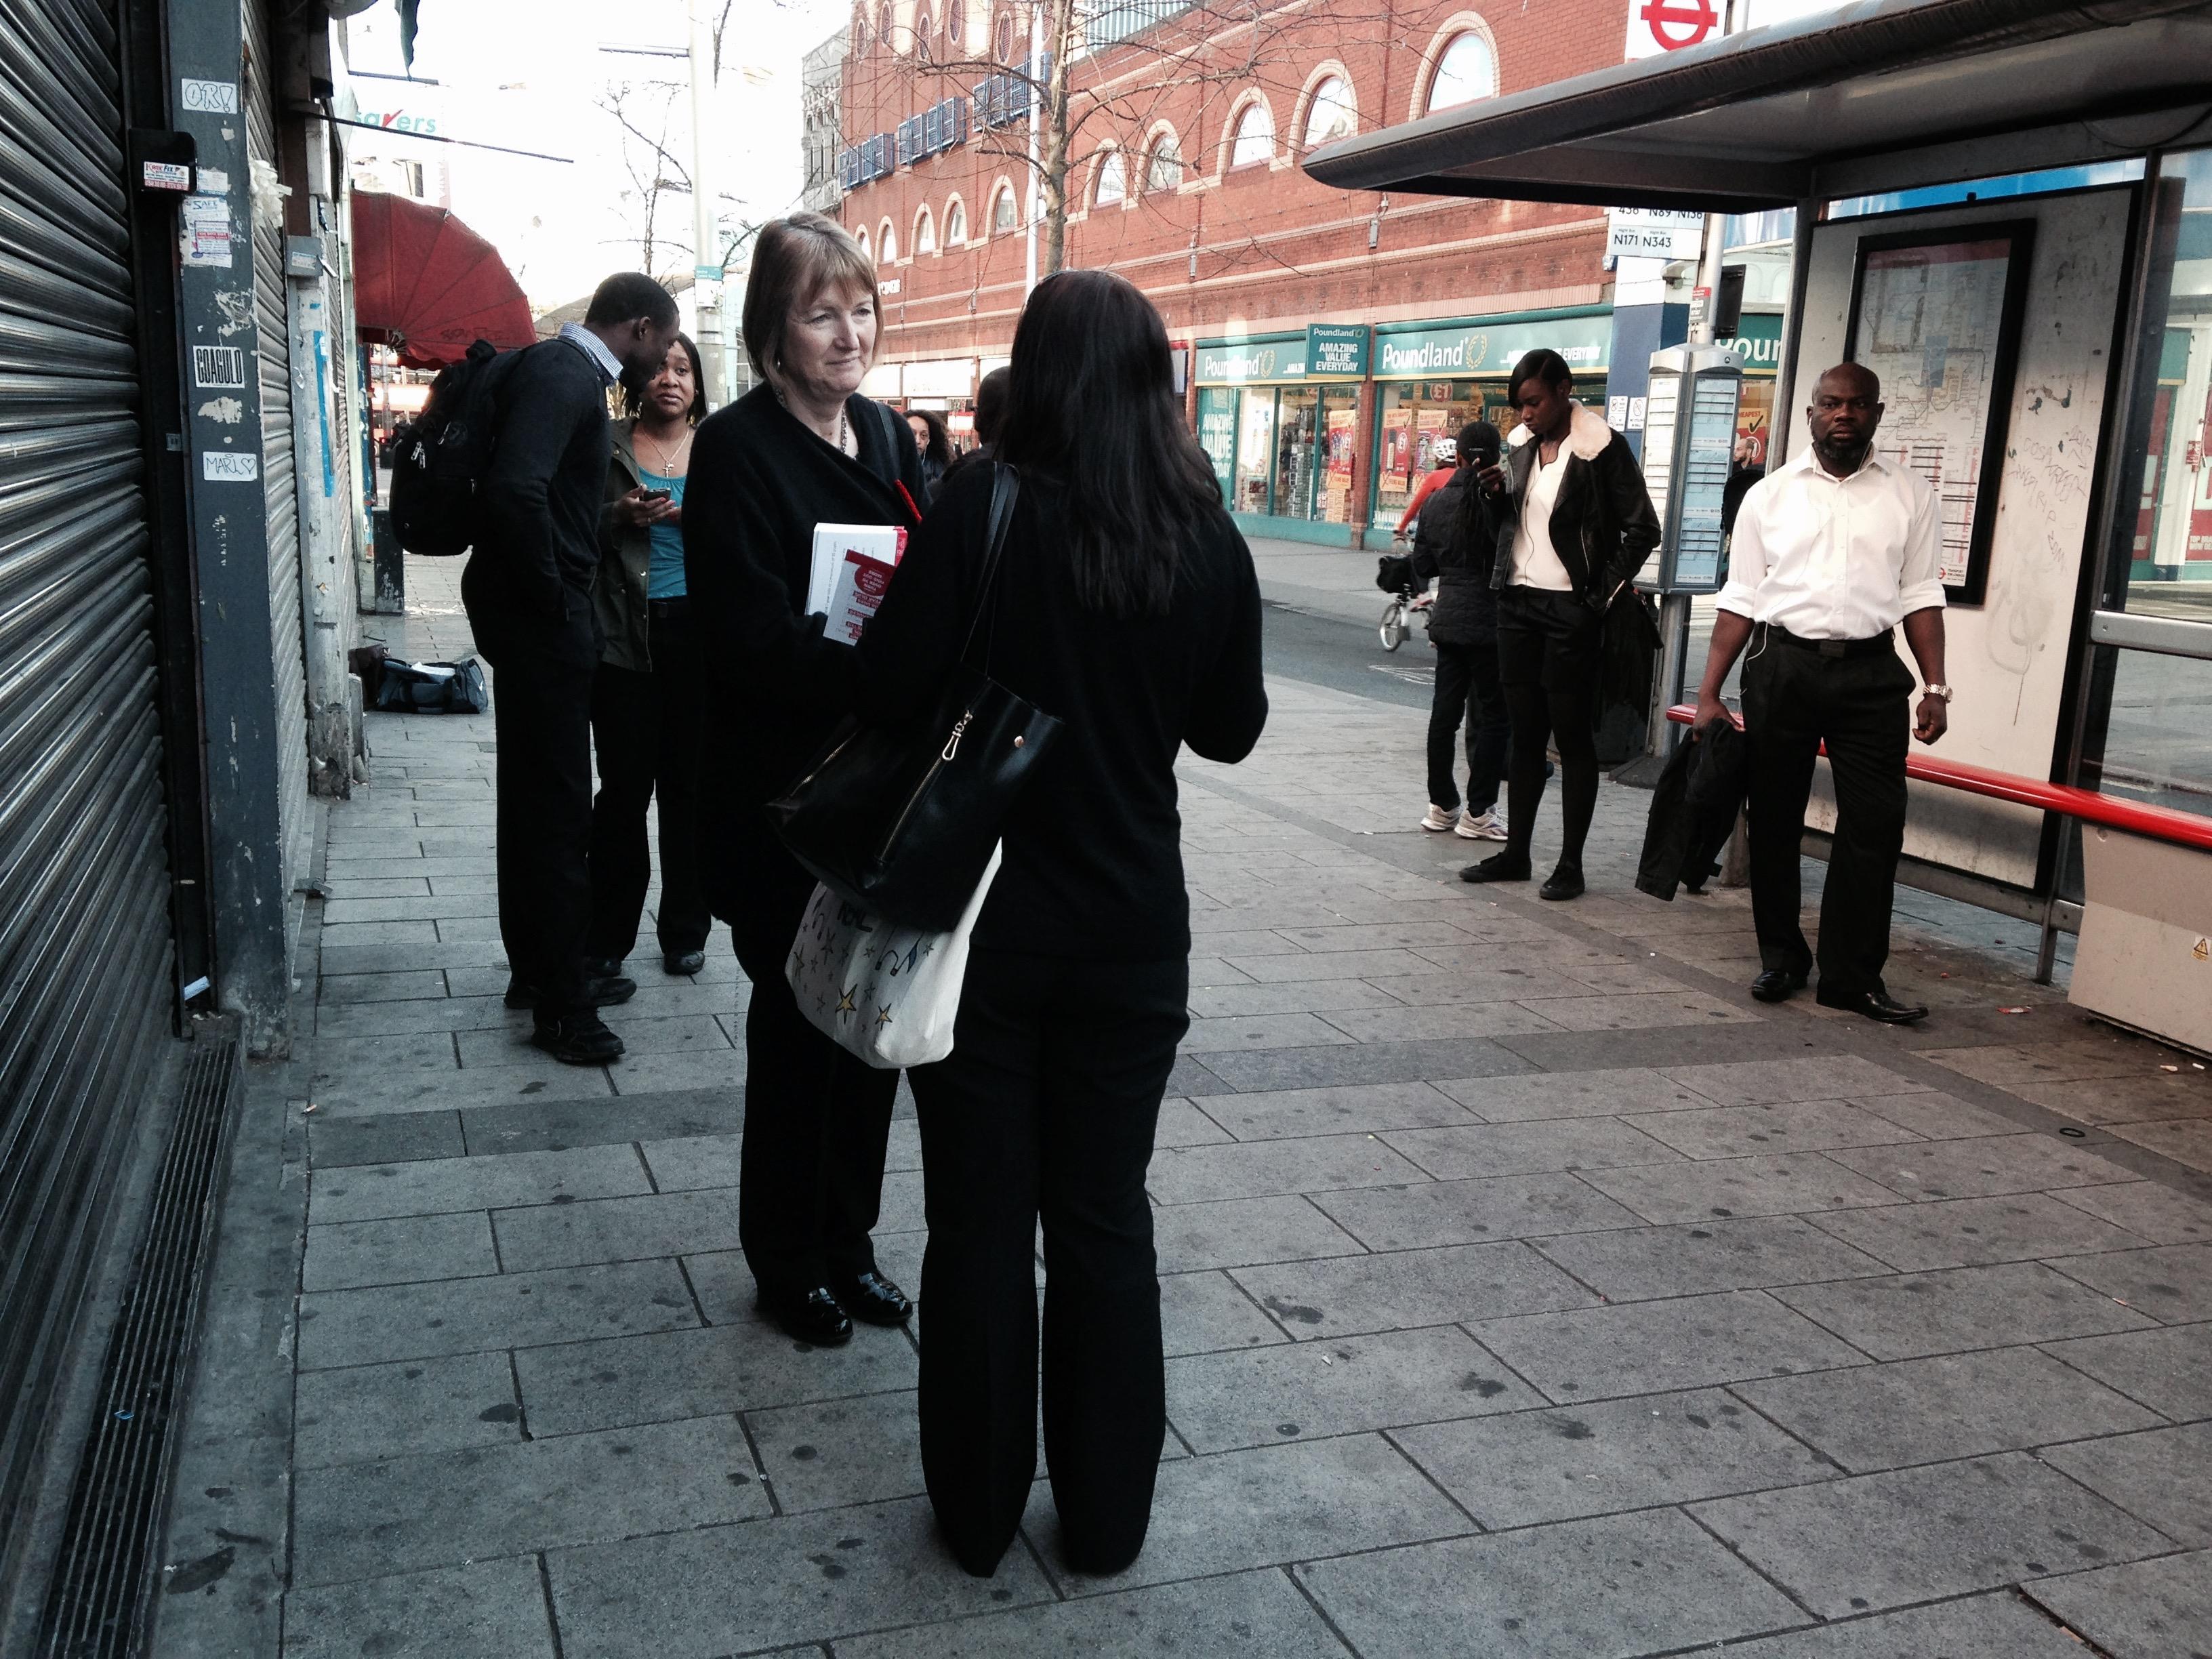 Peckham_bus_stop_21.4.15.jpg